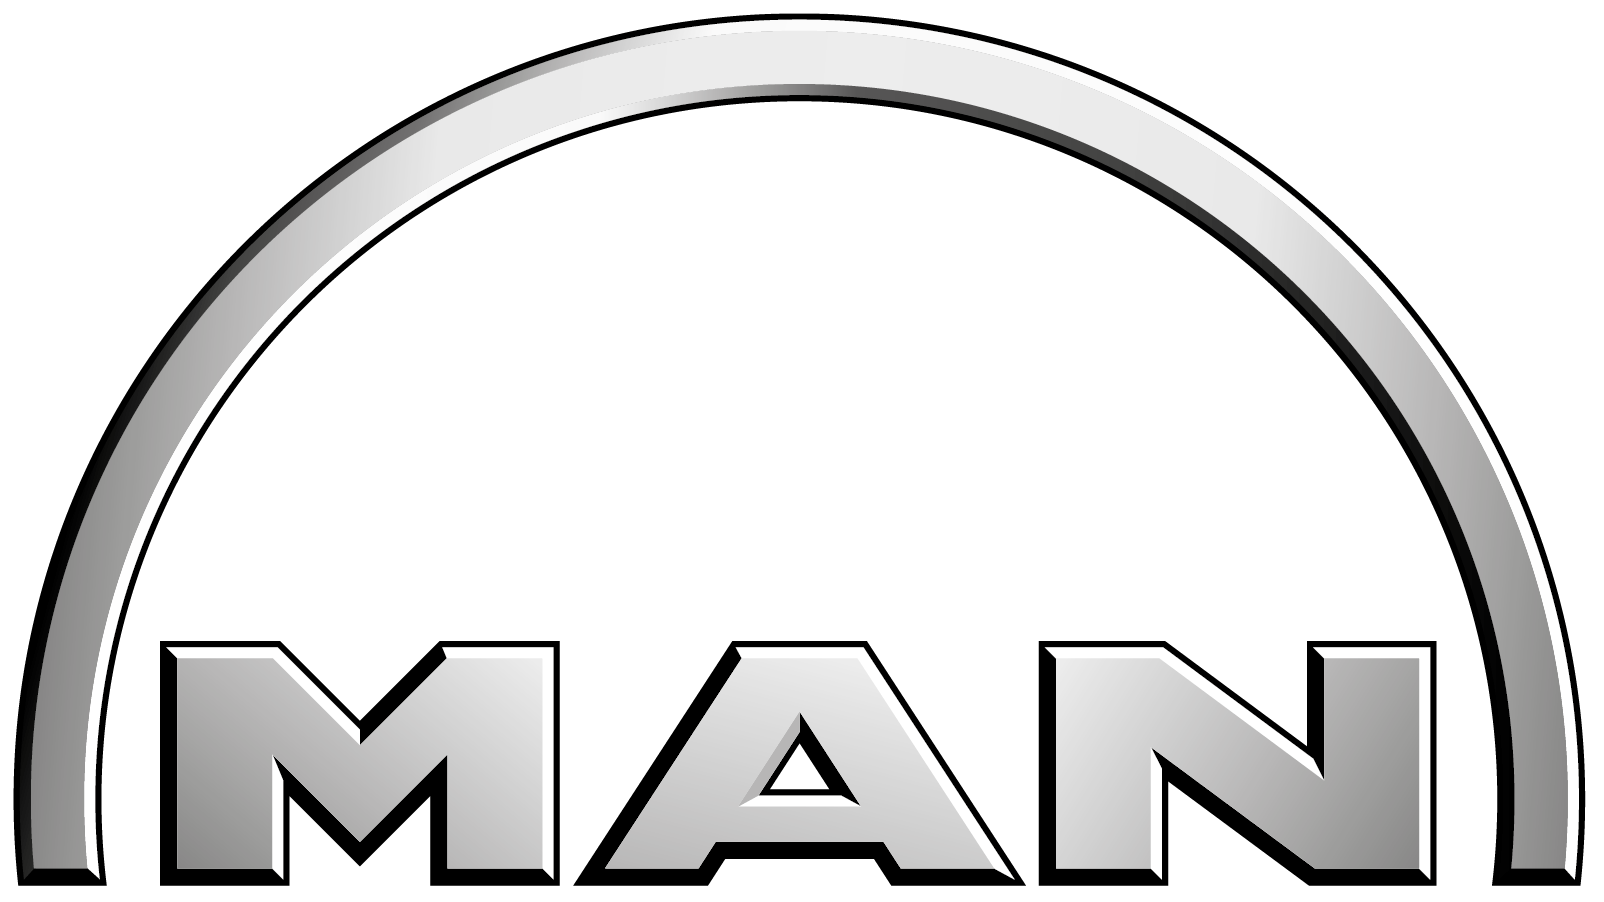 man logo freelogovectors.net